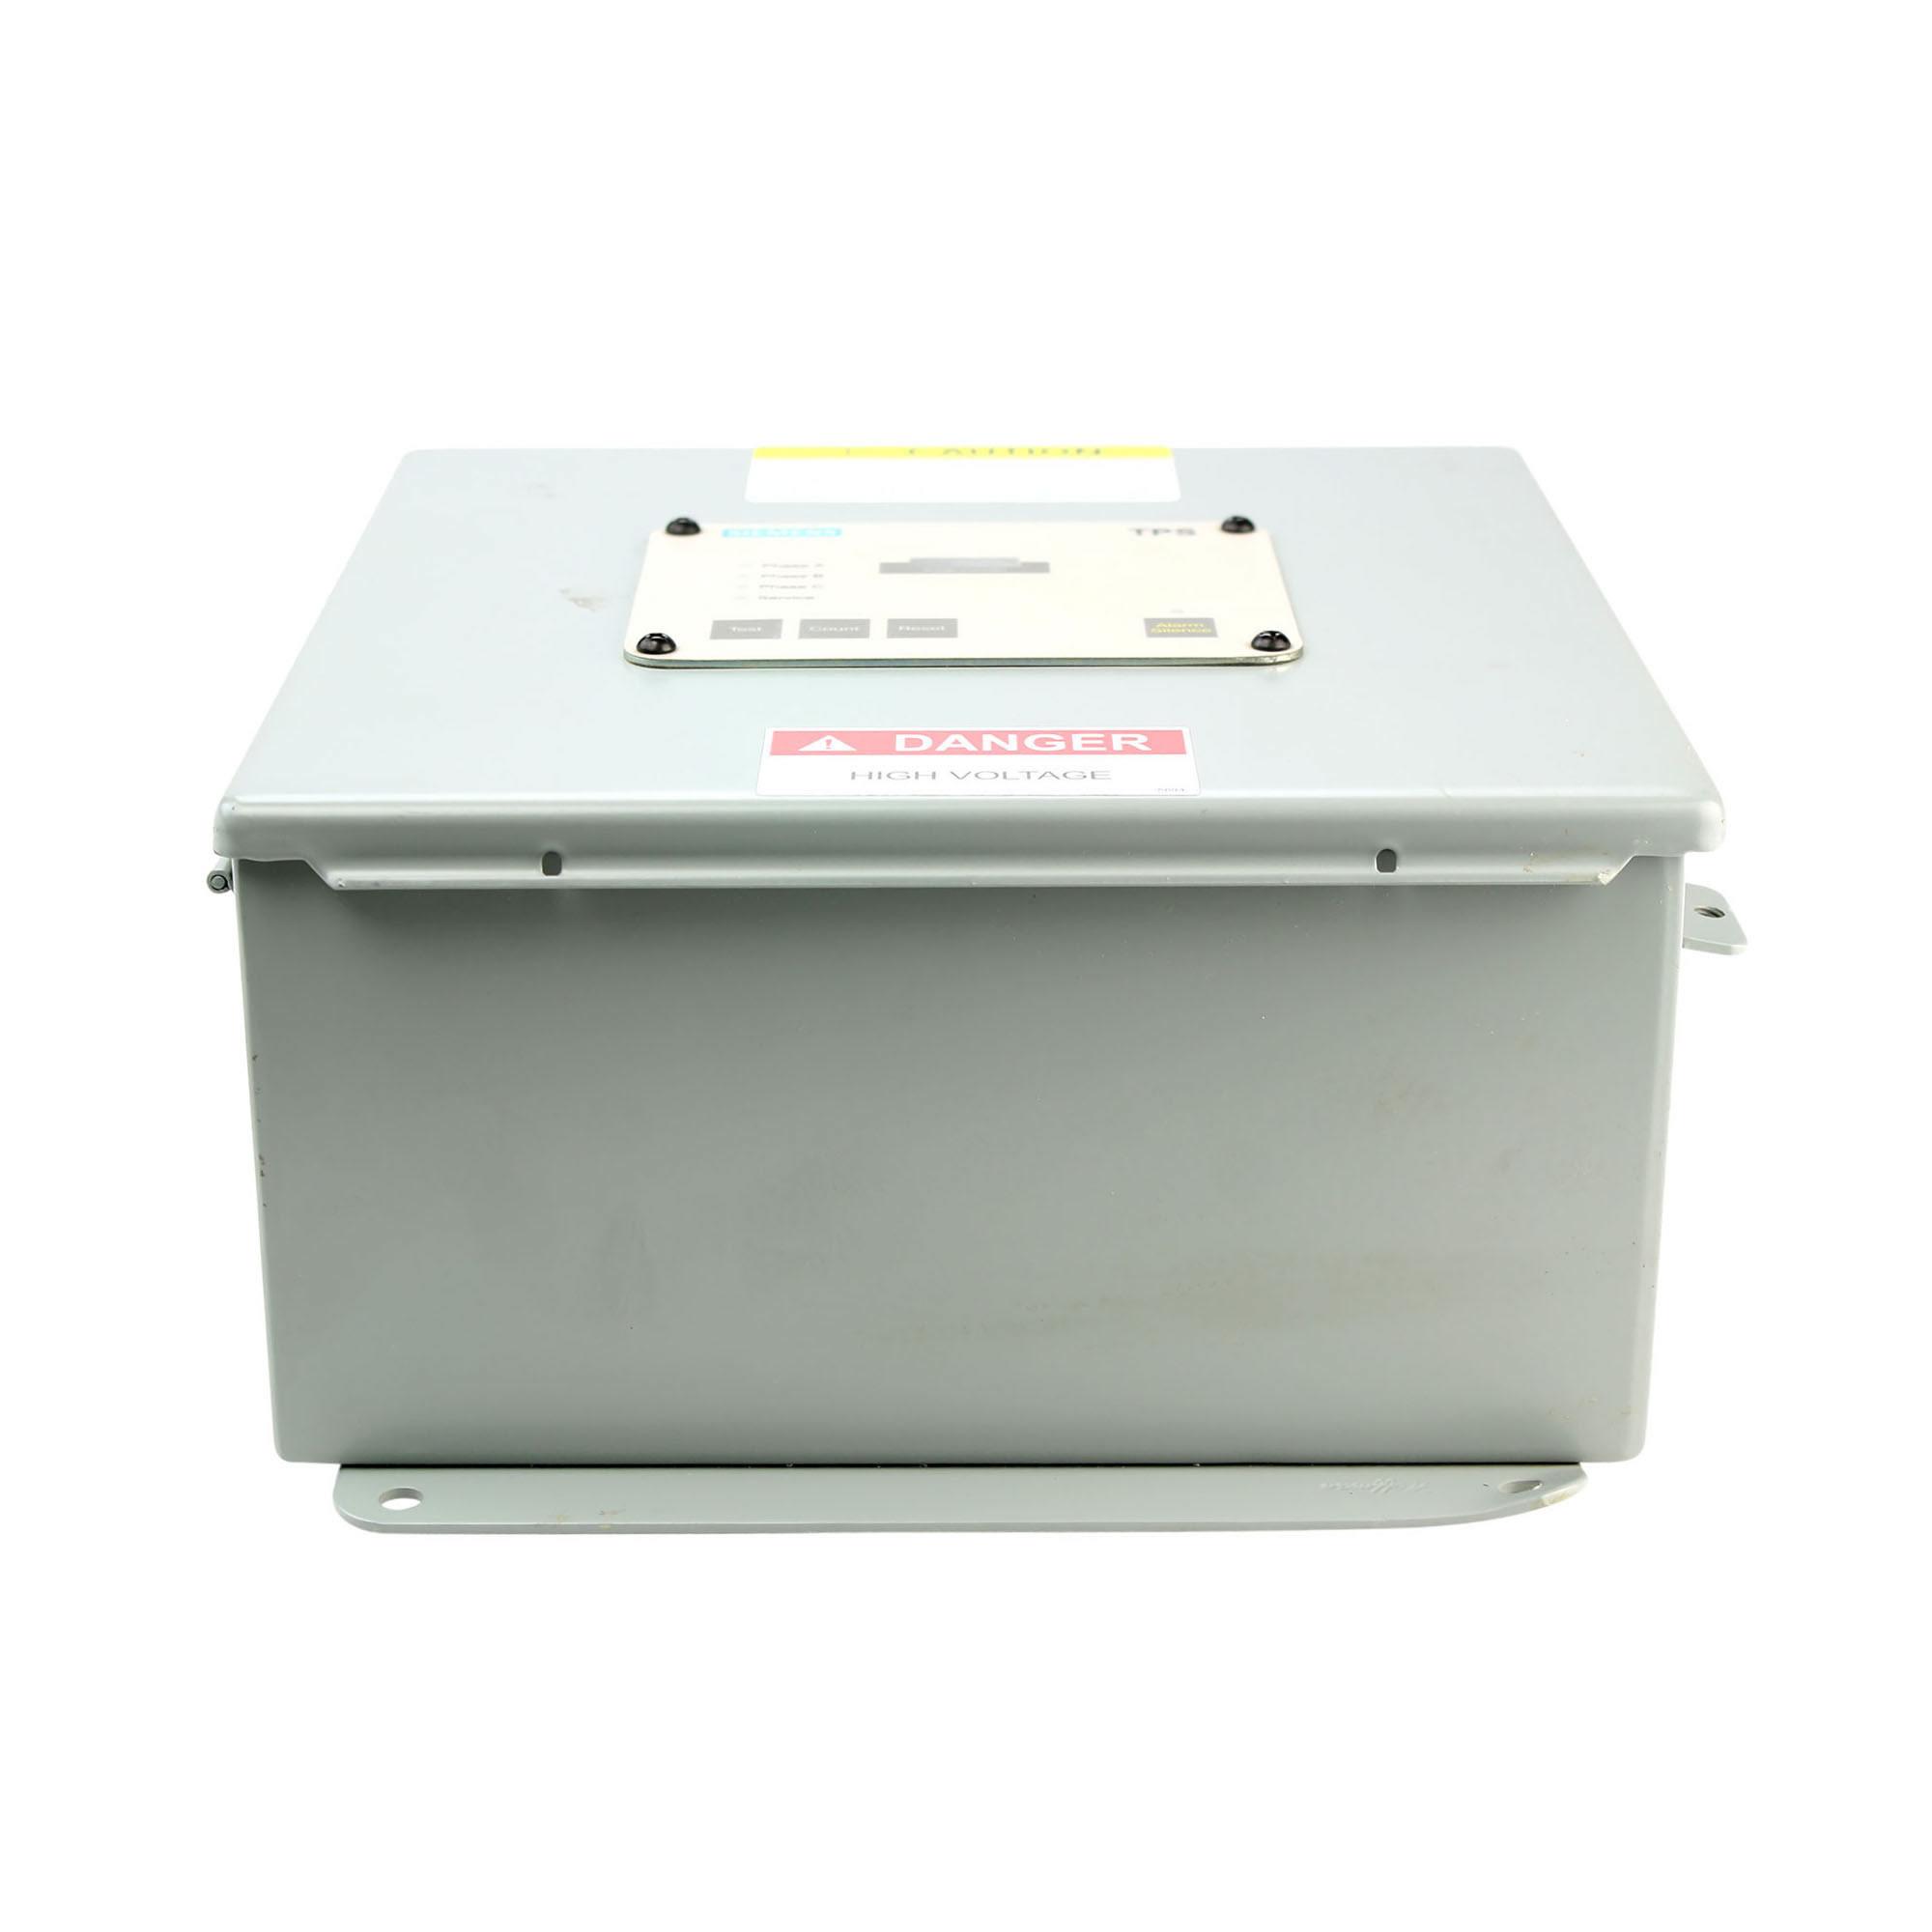 siemens tps e12 240 sc tps transient voltage surge protection tvss system ebay. Black Bedroom Furniture Sets. Home Design Ideas